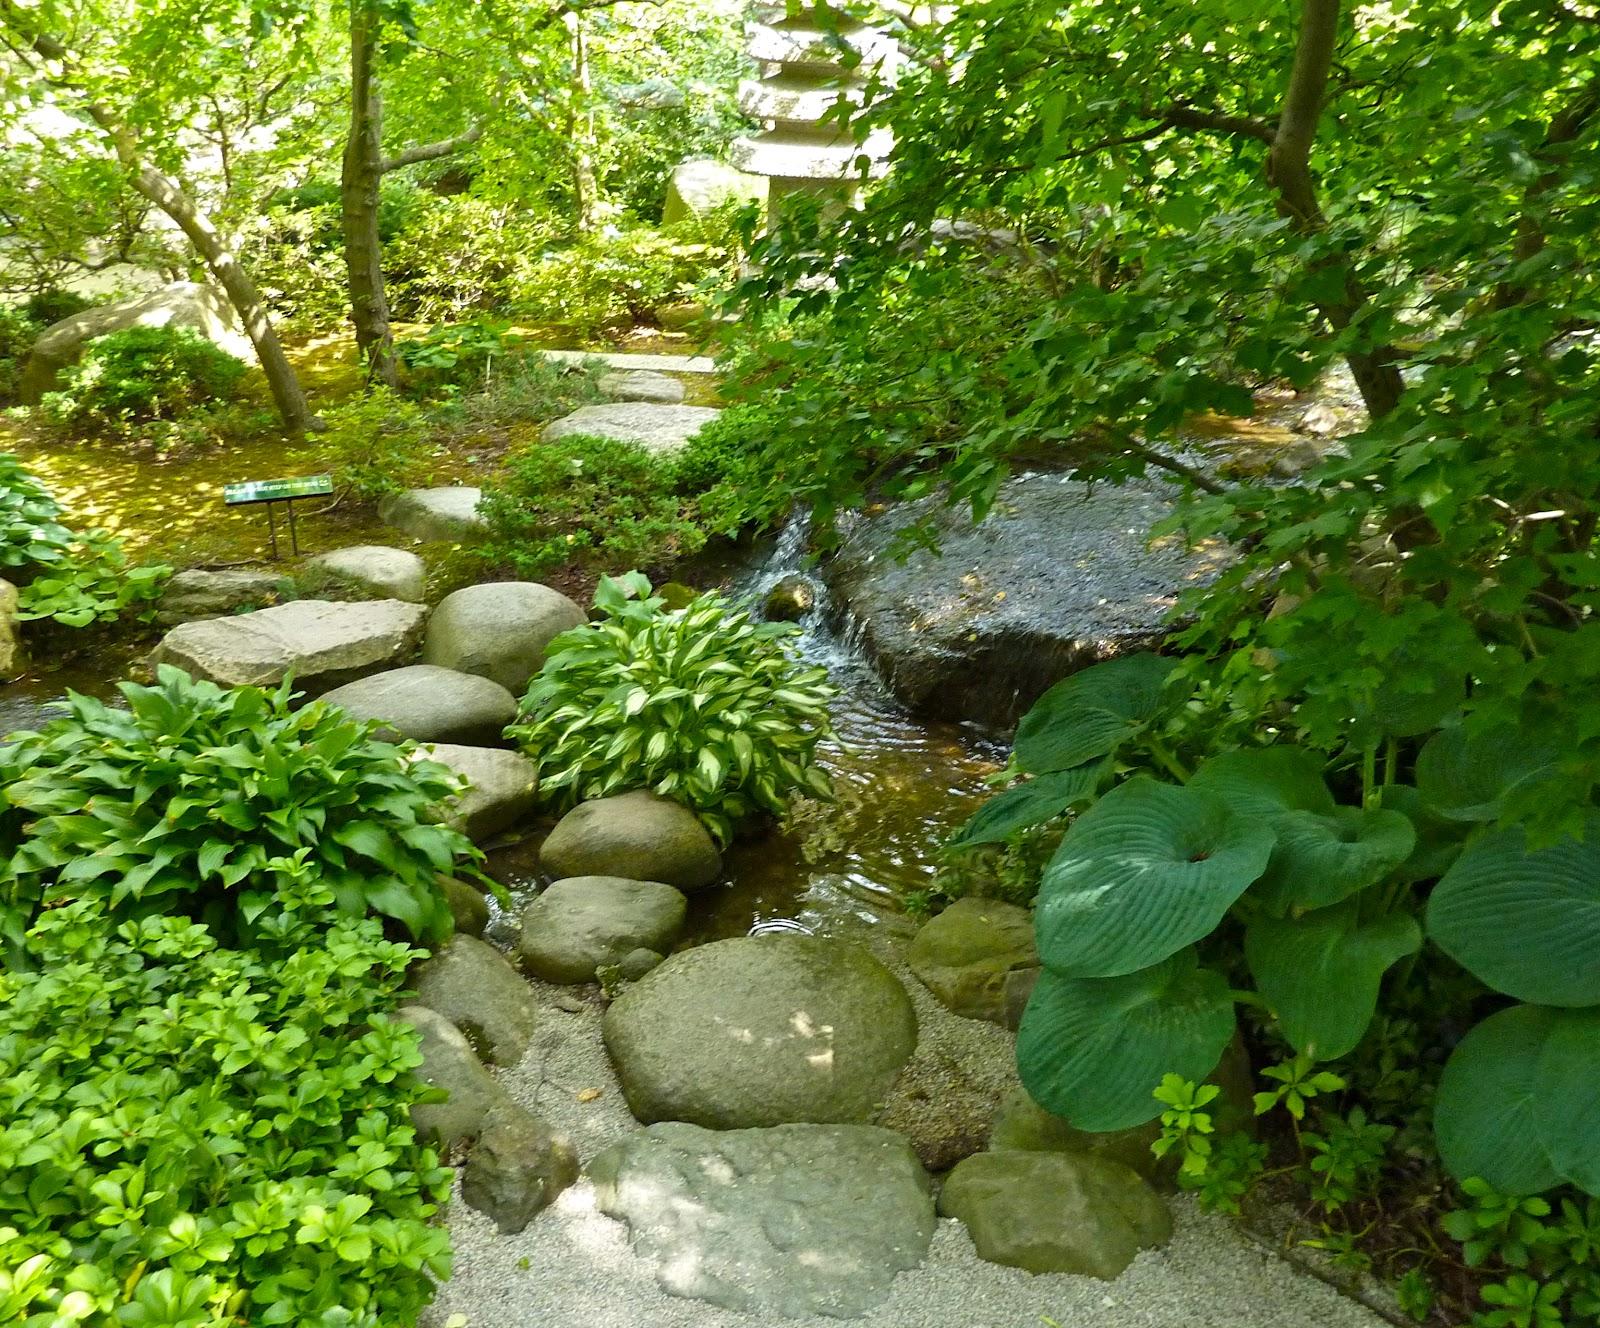 Garden of reflection japanese garden streams for Japanese garden plants pictures